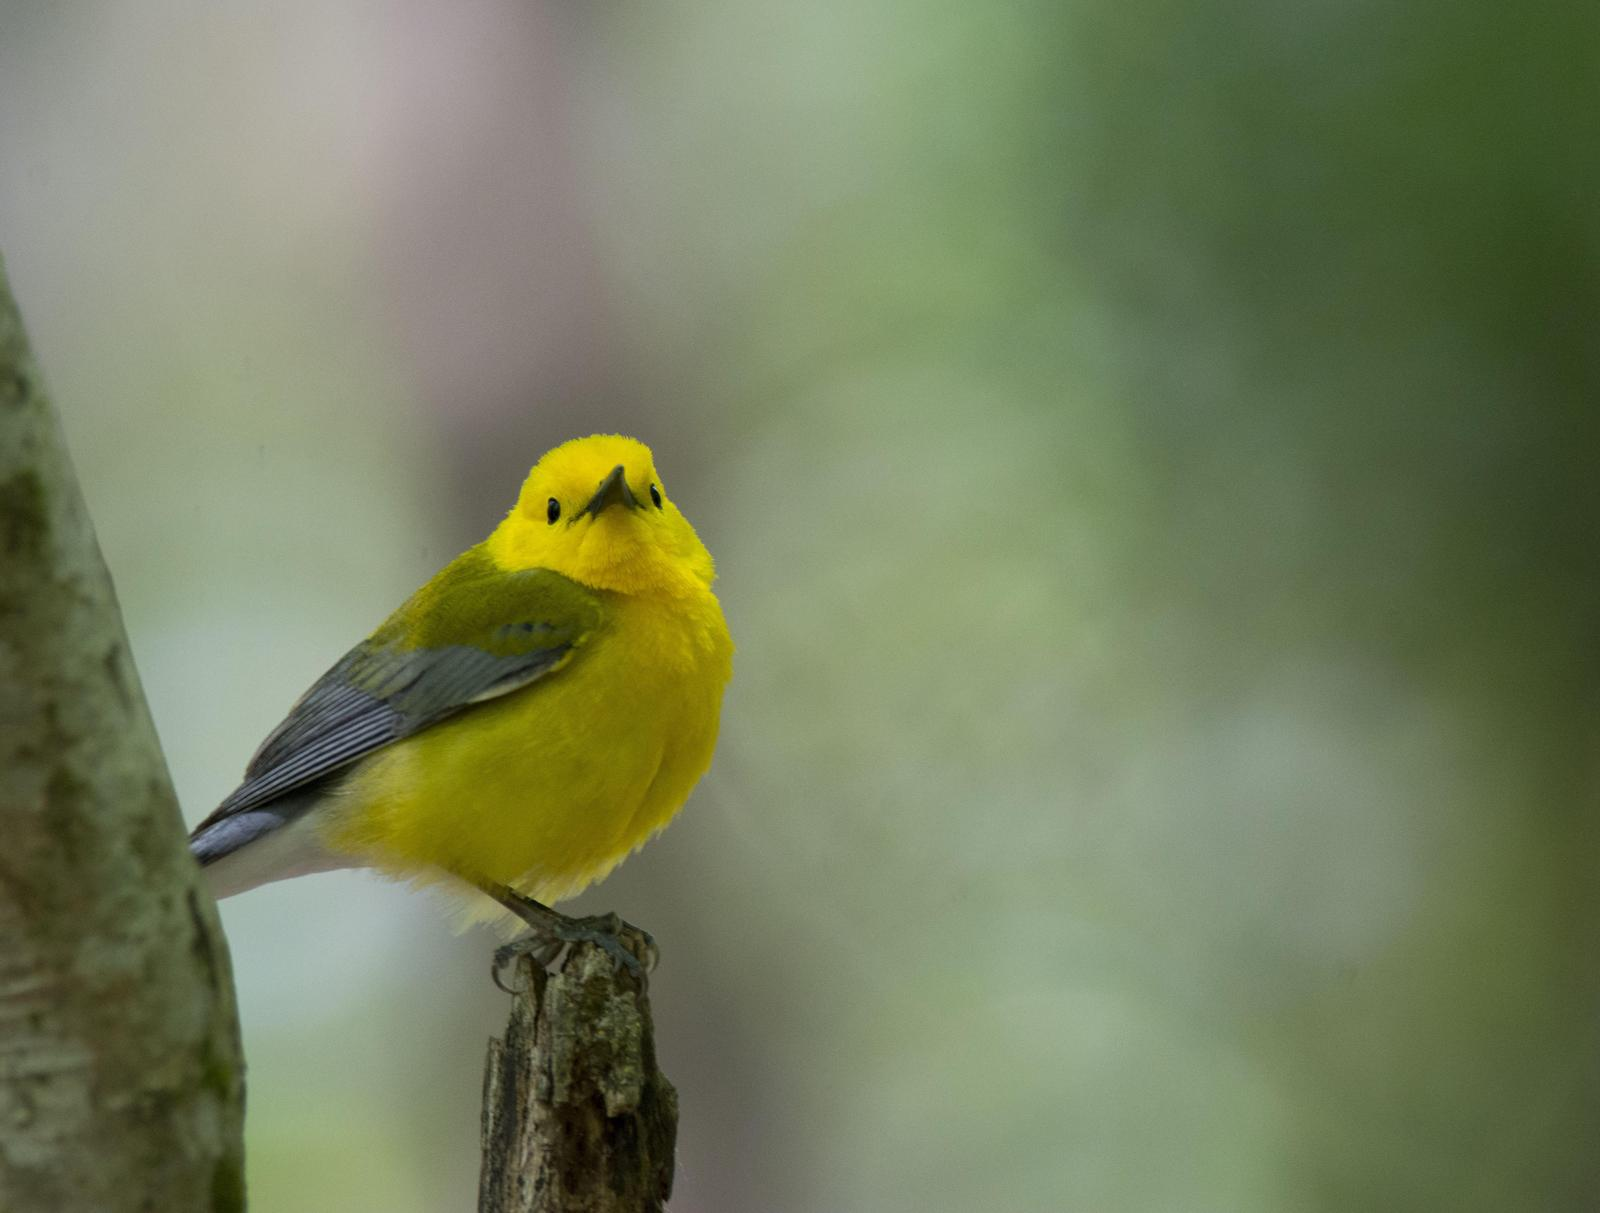 Prothonotary Warbler Photo by Jacob Zadik